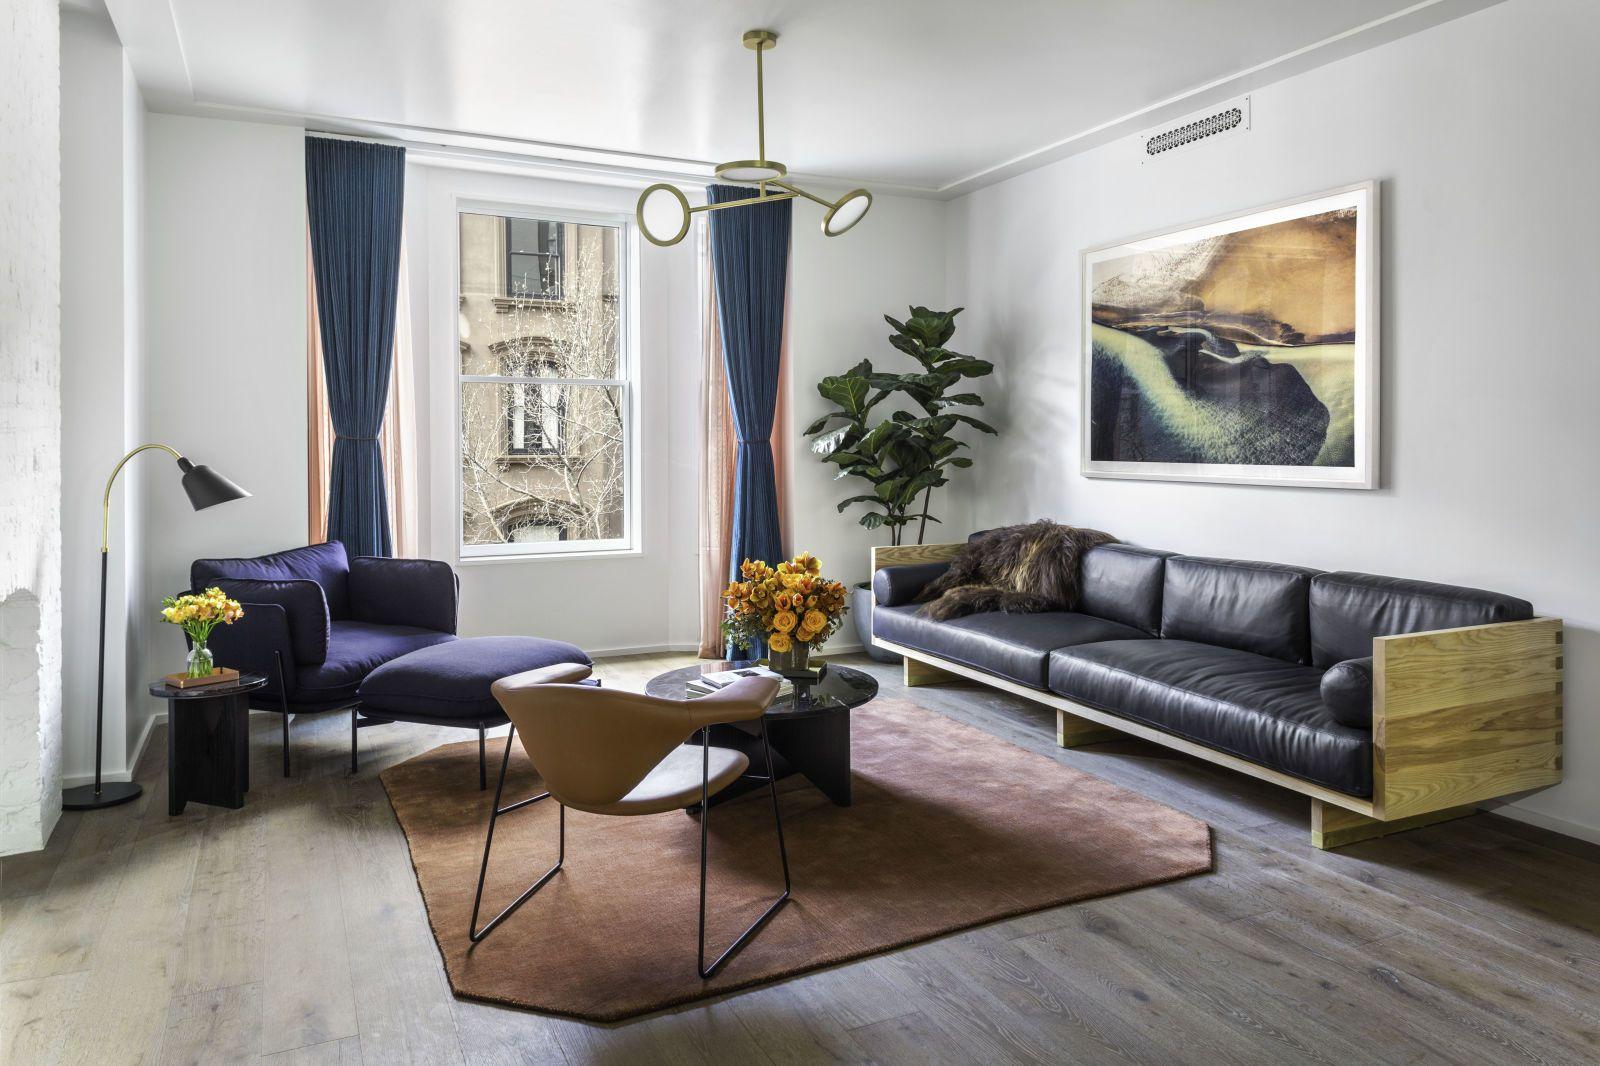 Matt Damon Is Buying The Most Insane Apartment | Chic ...